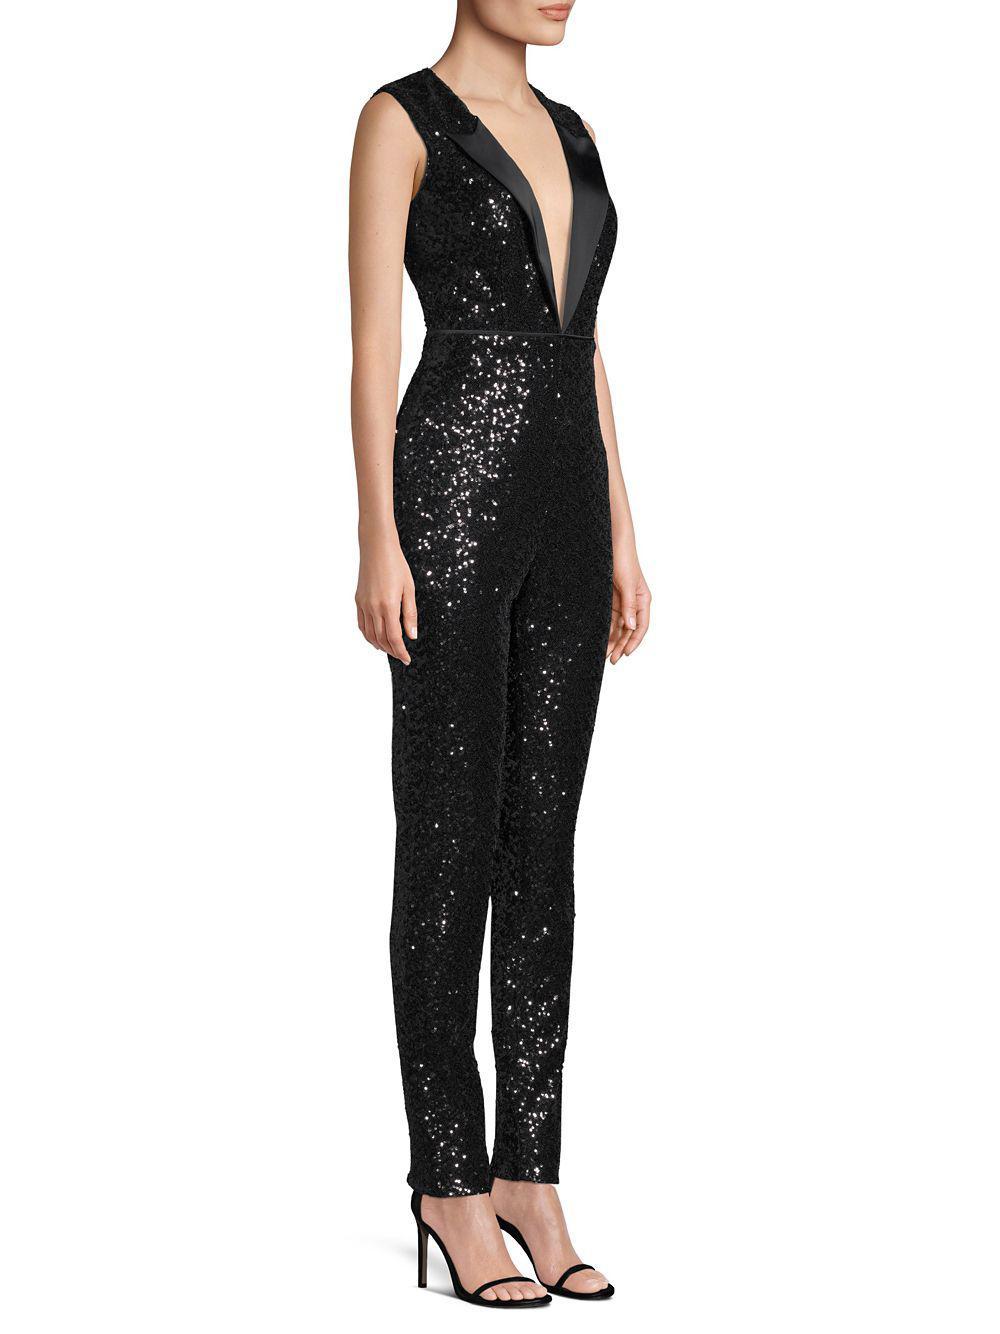 301f954c065 Aidan By Aidan Mattox Sequin Tuxedo-look V-neck Jumpsuit in Black - Lyst